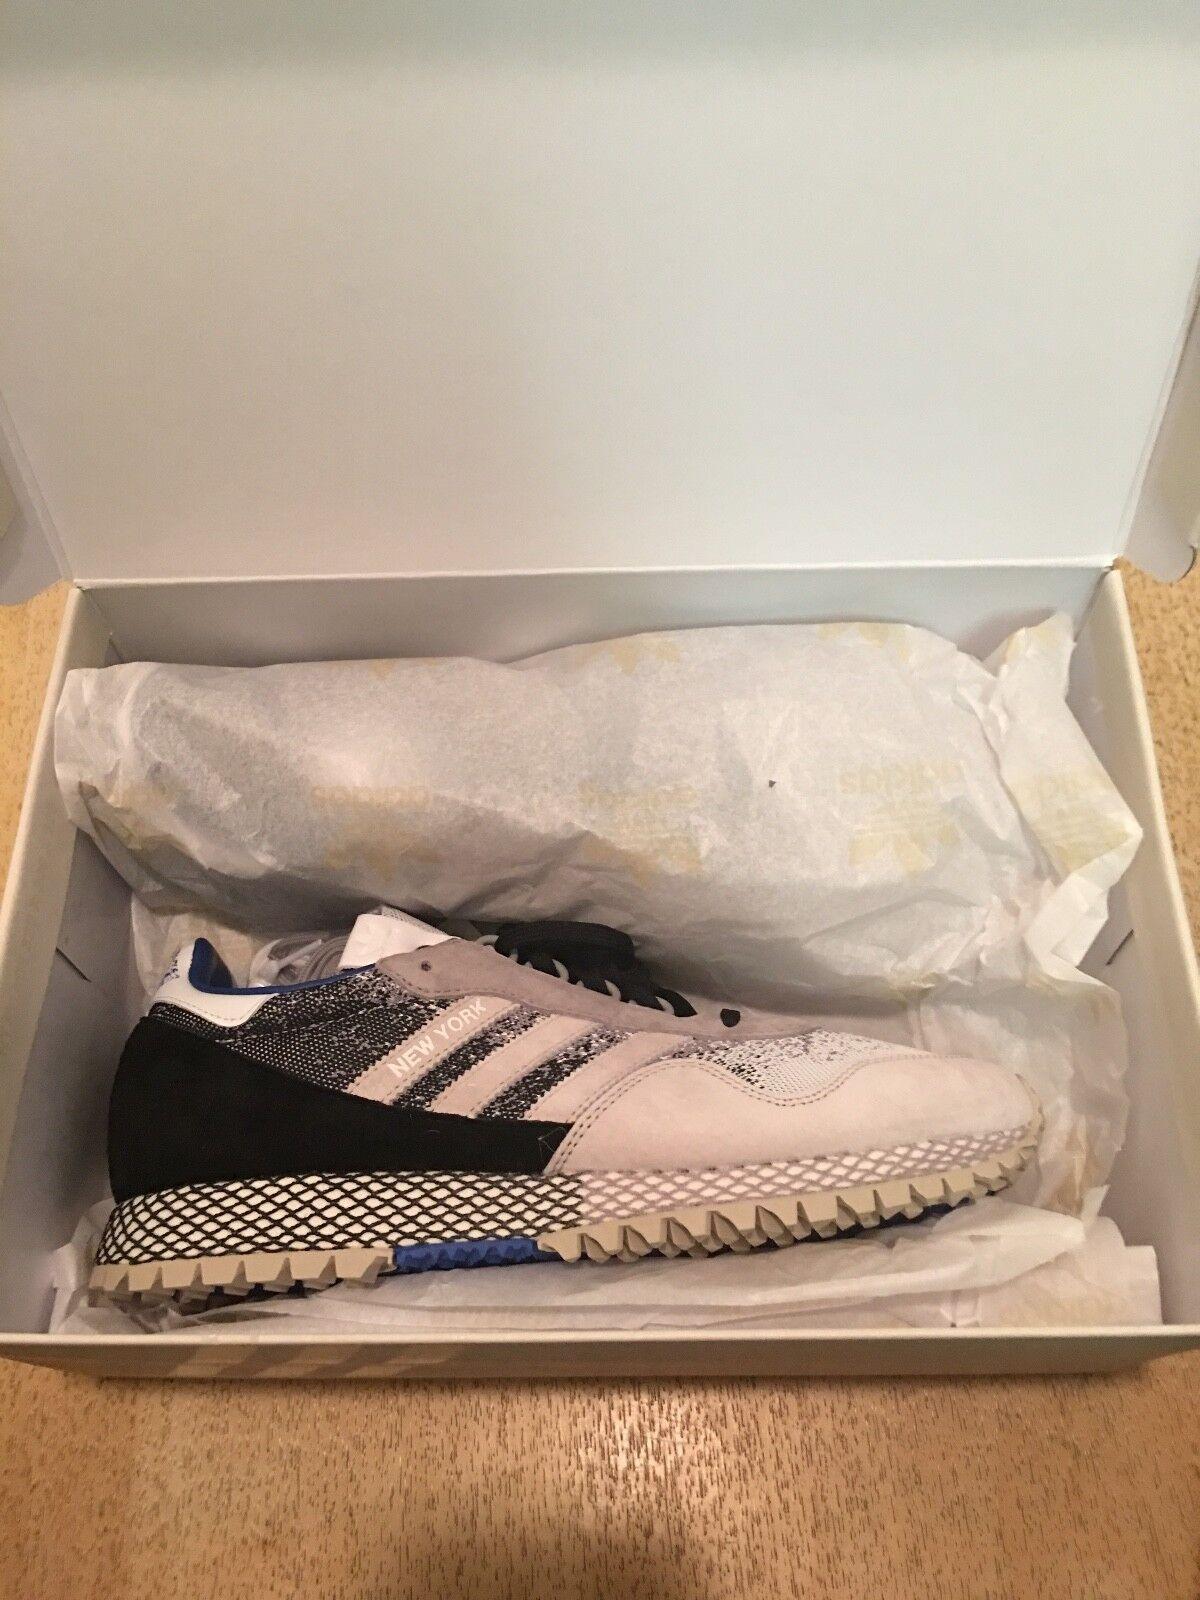 Adidas hanon new york sz - 9.